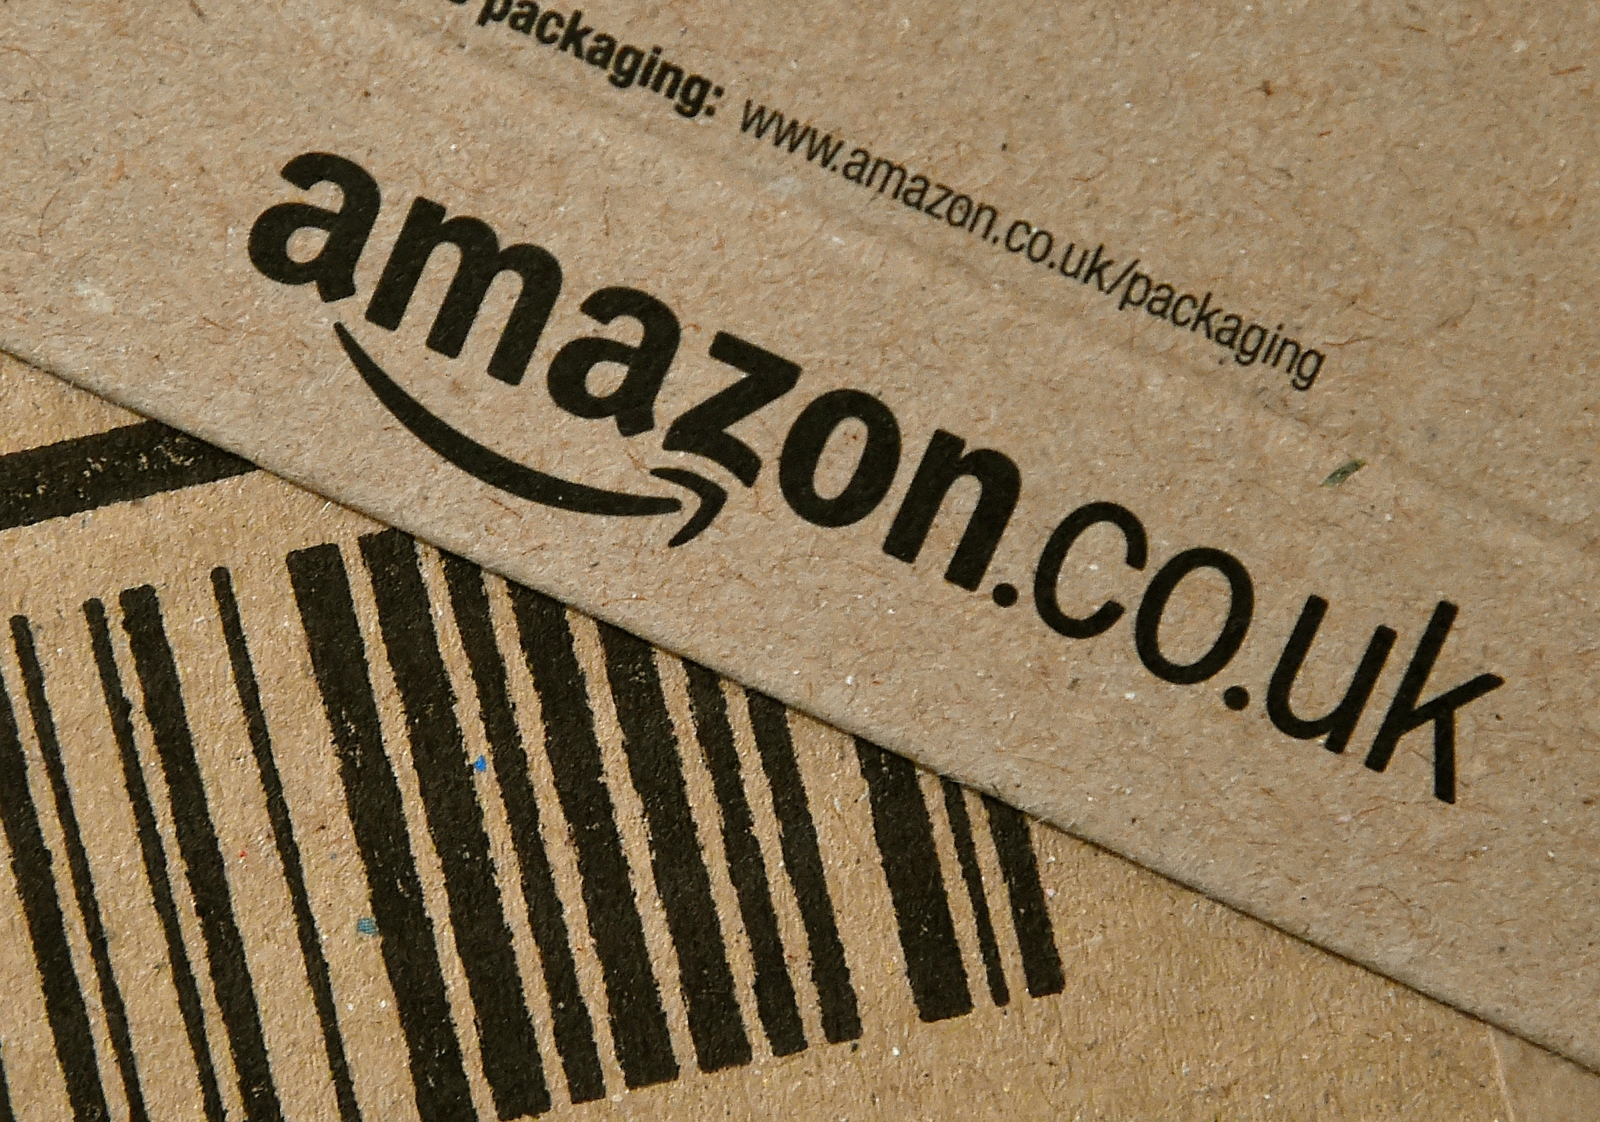 Amazon to create 5000 UK jobs